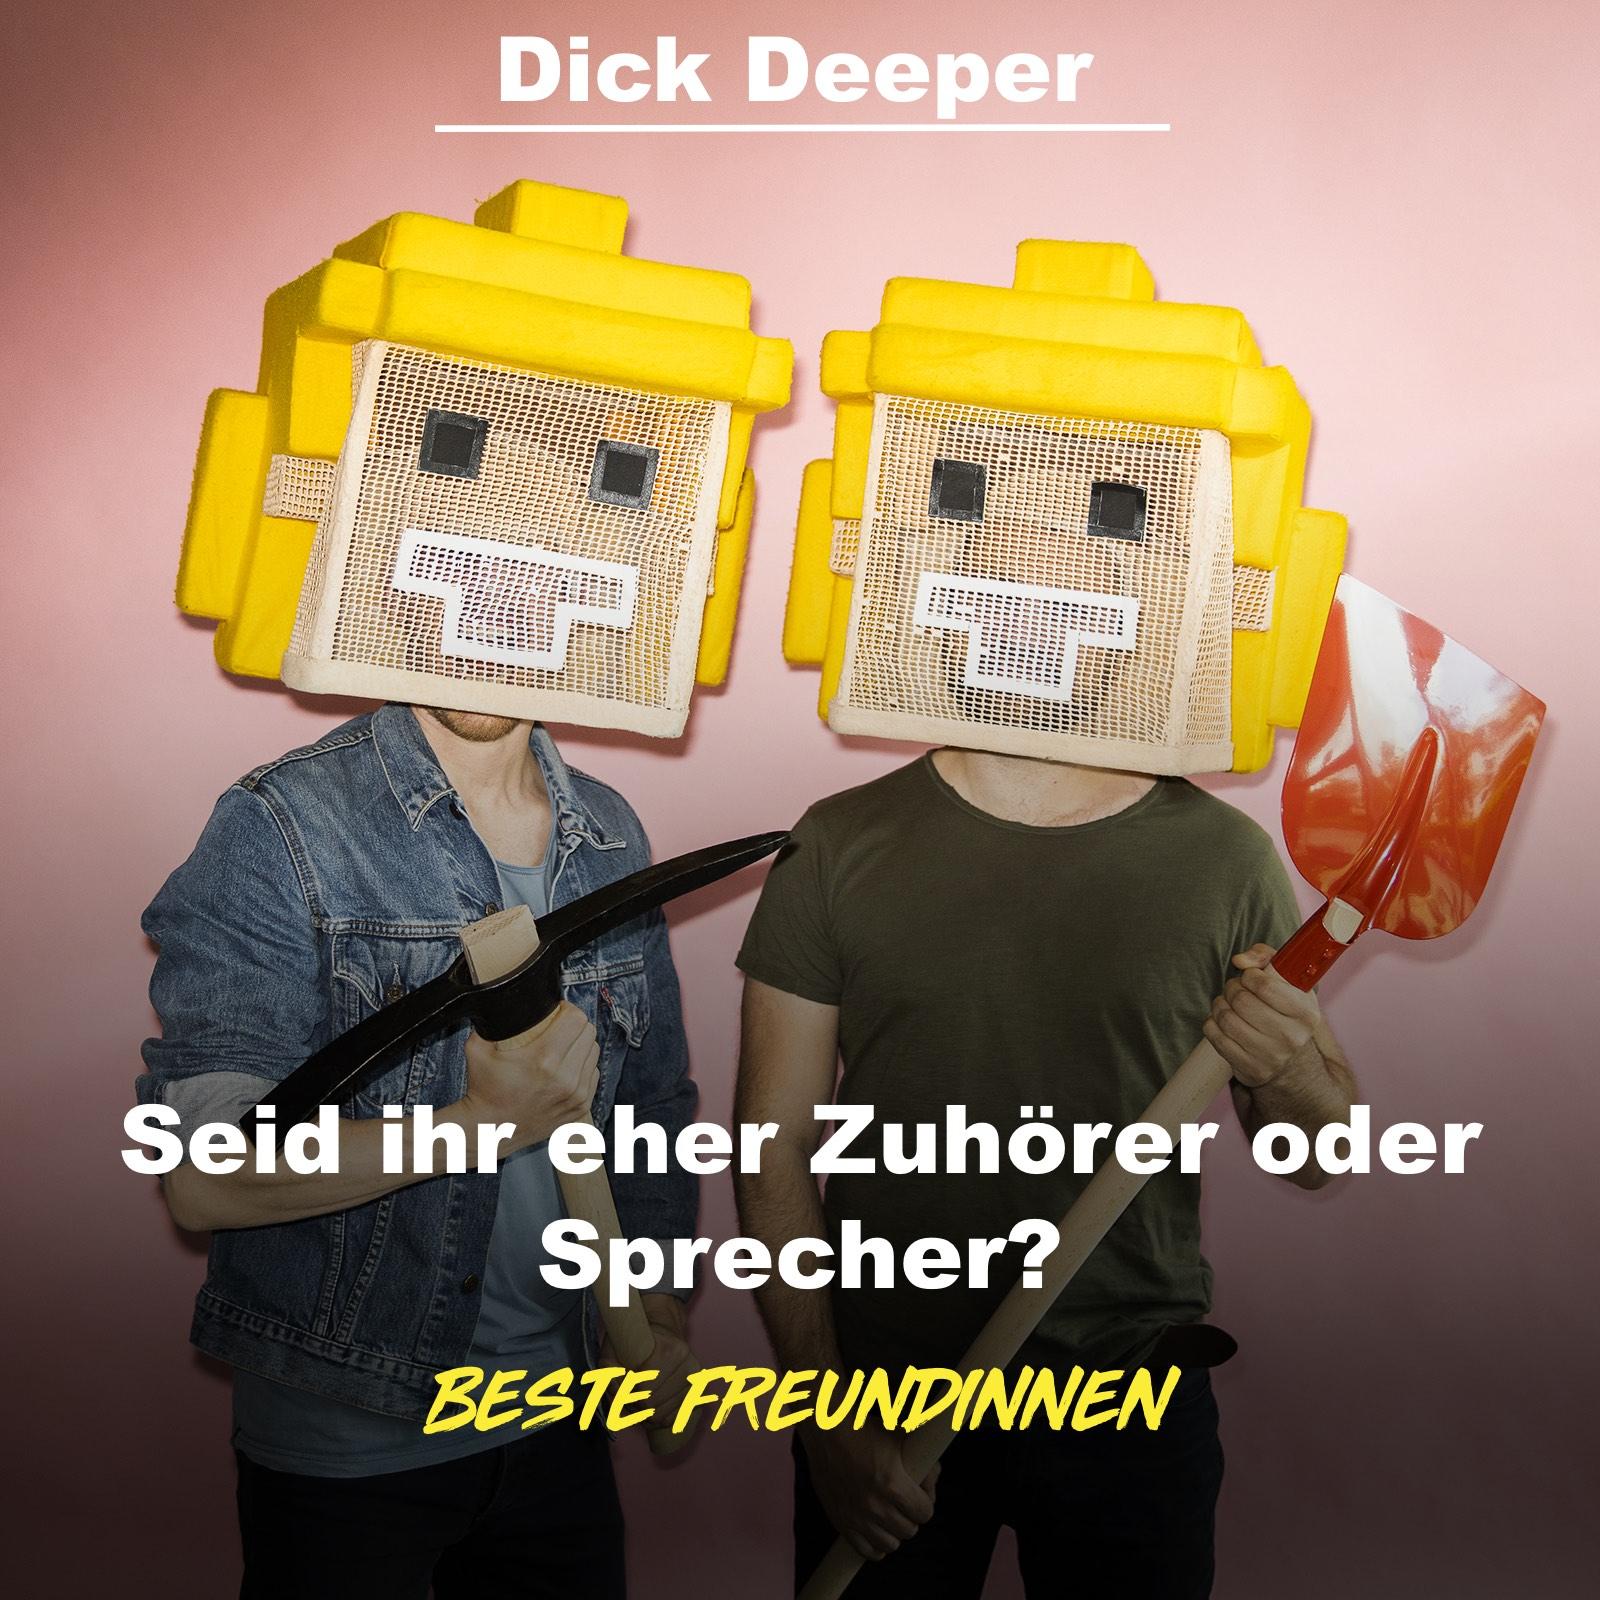 DICK DEEPER - Seid ihr eher Zuhörer oder Sprecher?